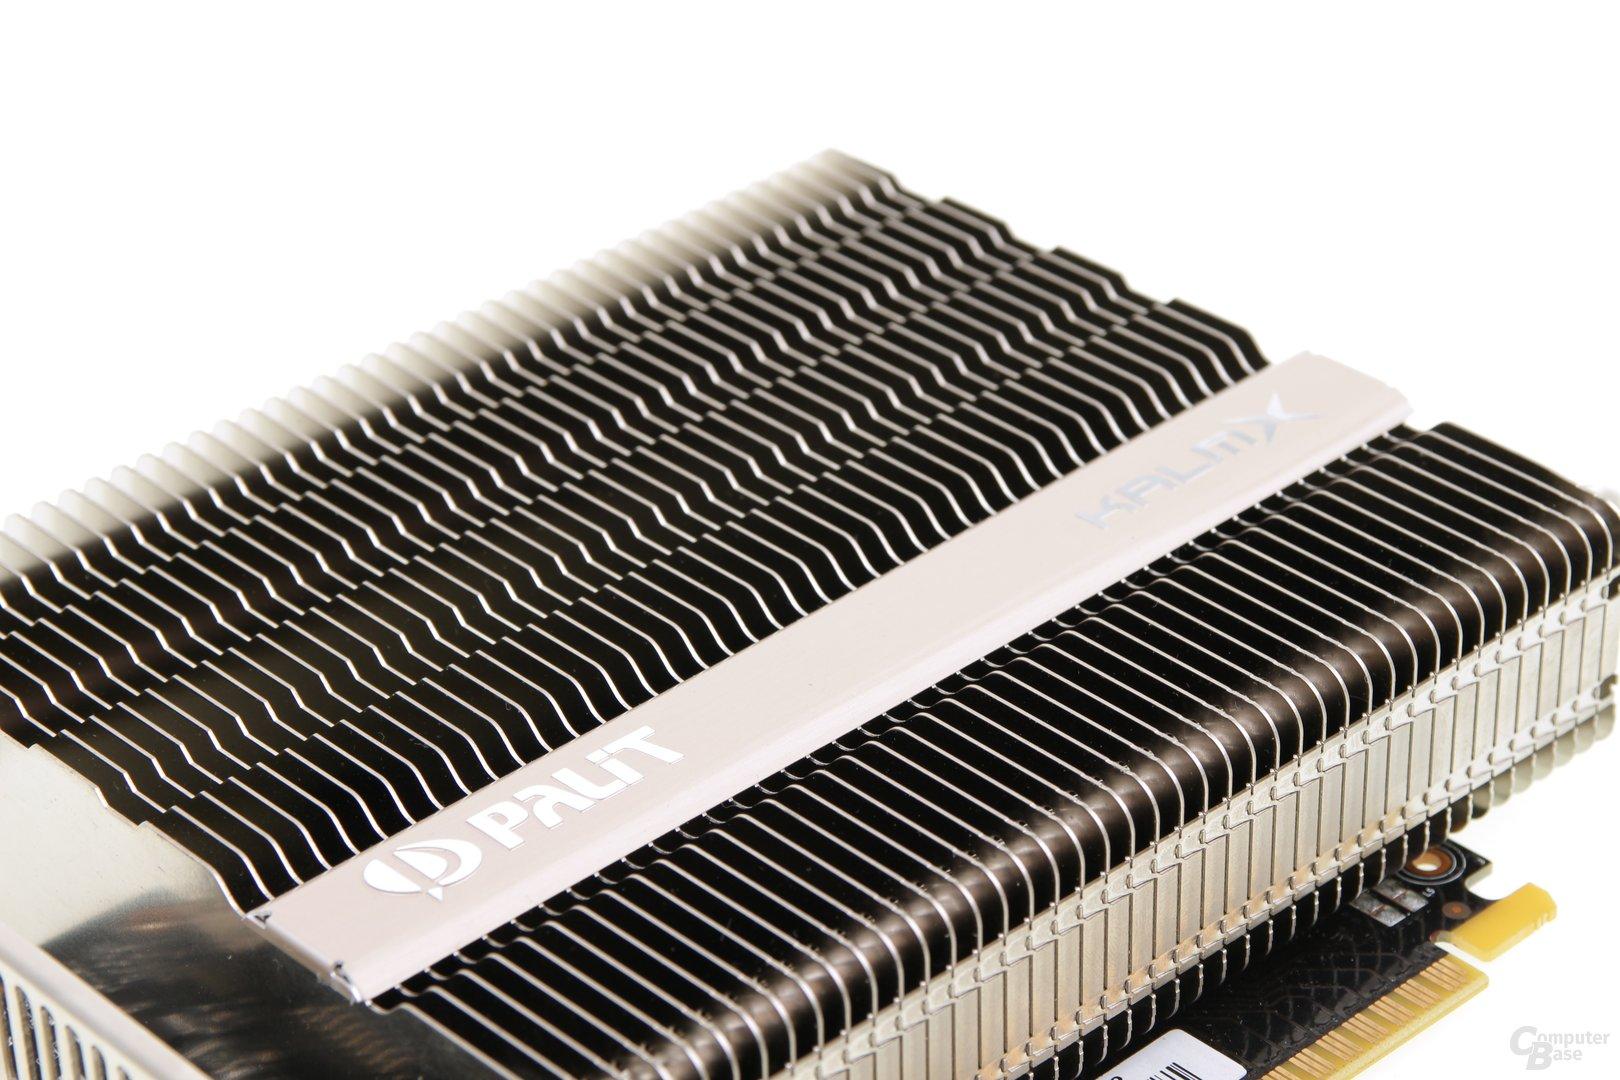 Palit GeForce GTX 750 Ti KalmX - Kühler